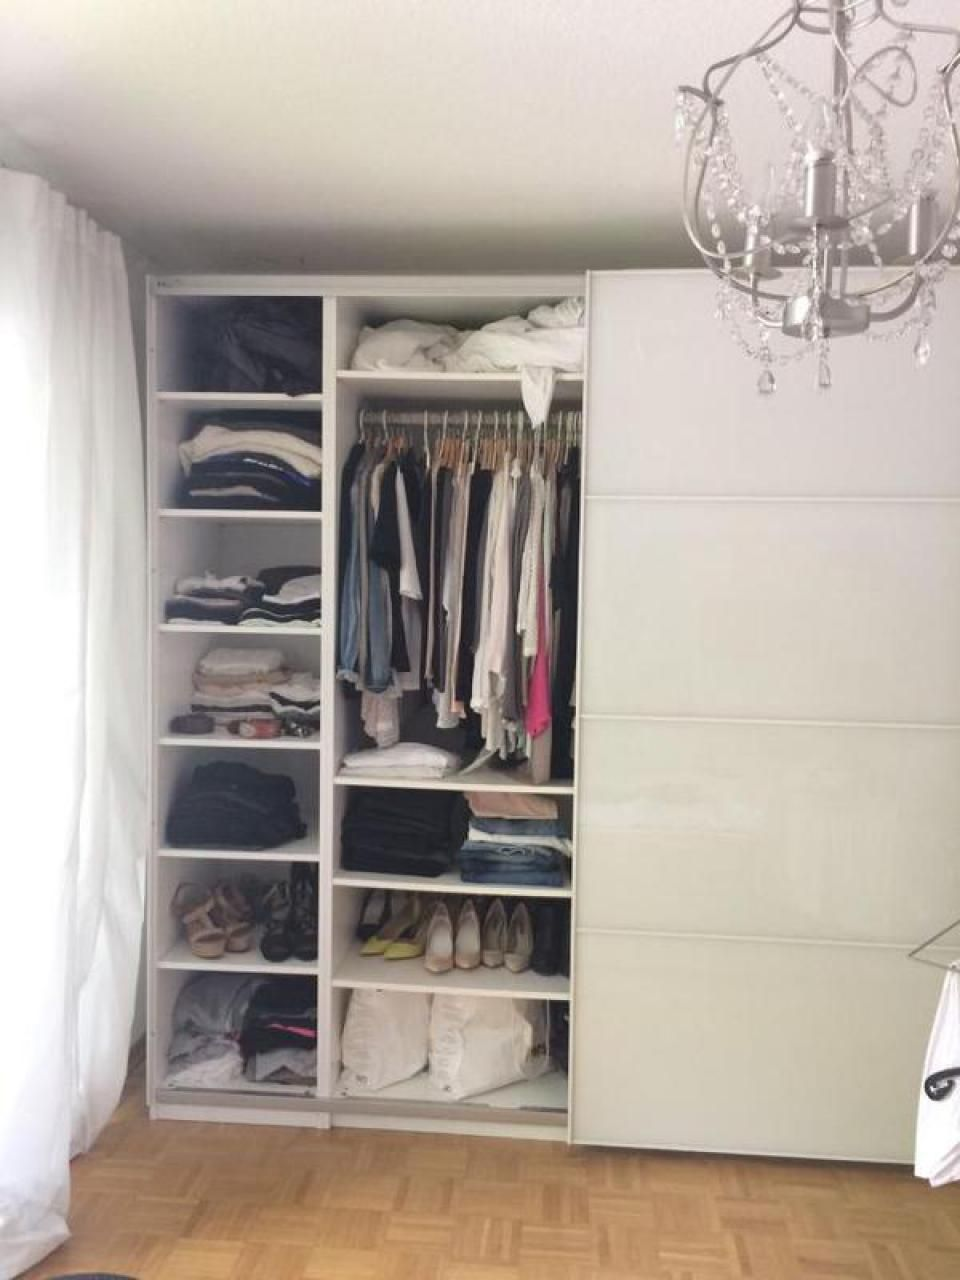 ikea schrank schiebetren excellent full size of pax xx cm ikea schiebetren gnstig with ikea. Black Bedroom Furniture Sets. Home Design Ideas